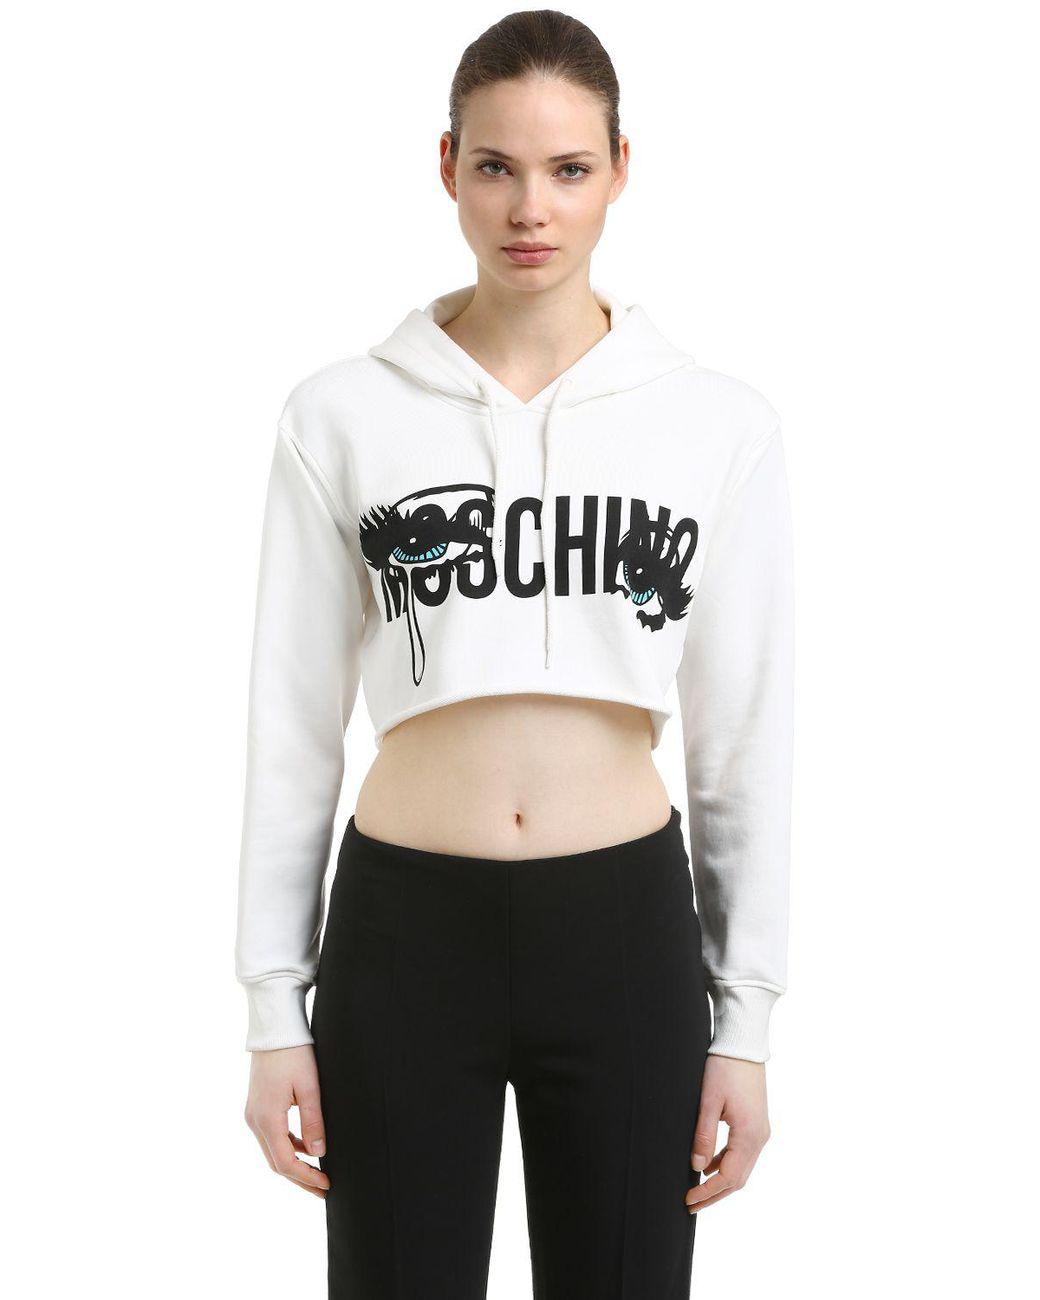 b45802bedeb30 Moschino Eyes Hooded Cotton Crop Sweatshirt in White - Lyst